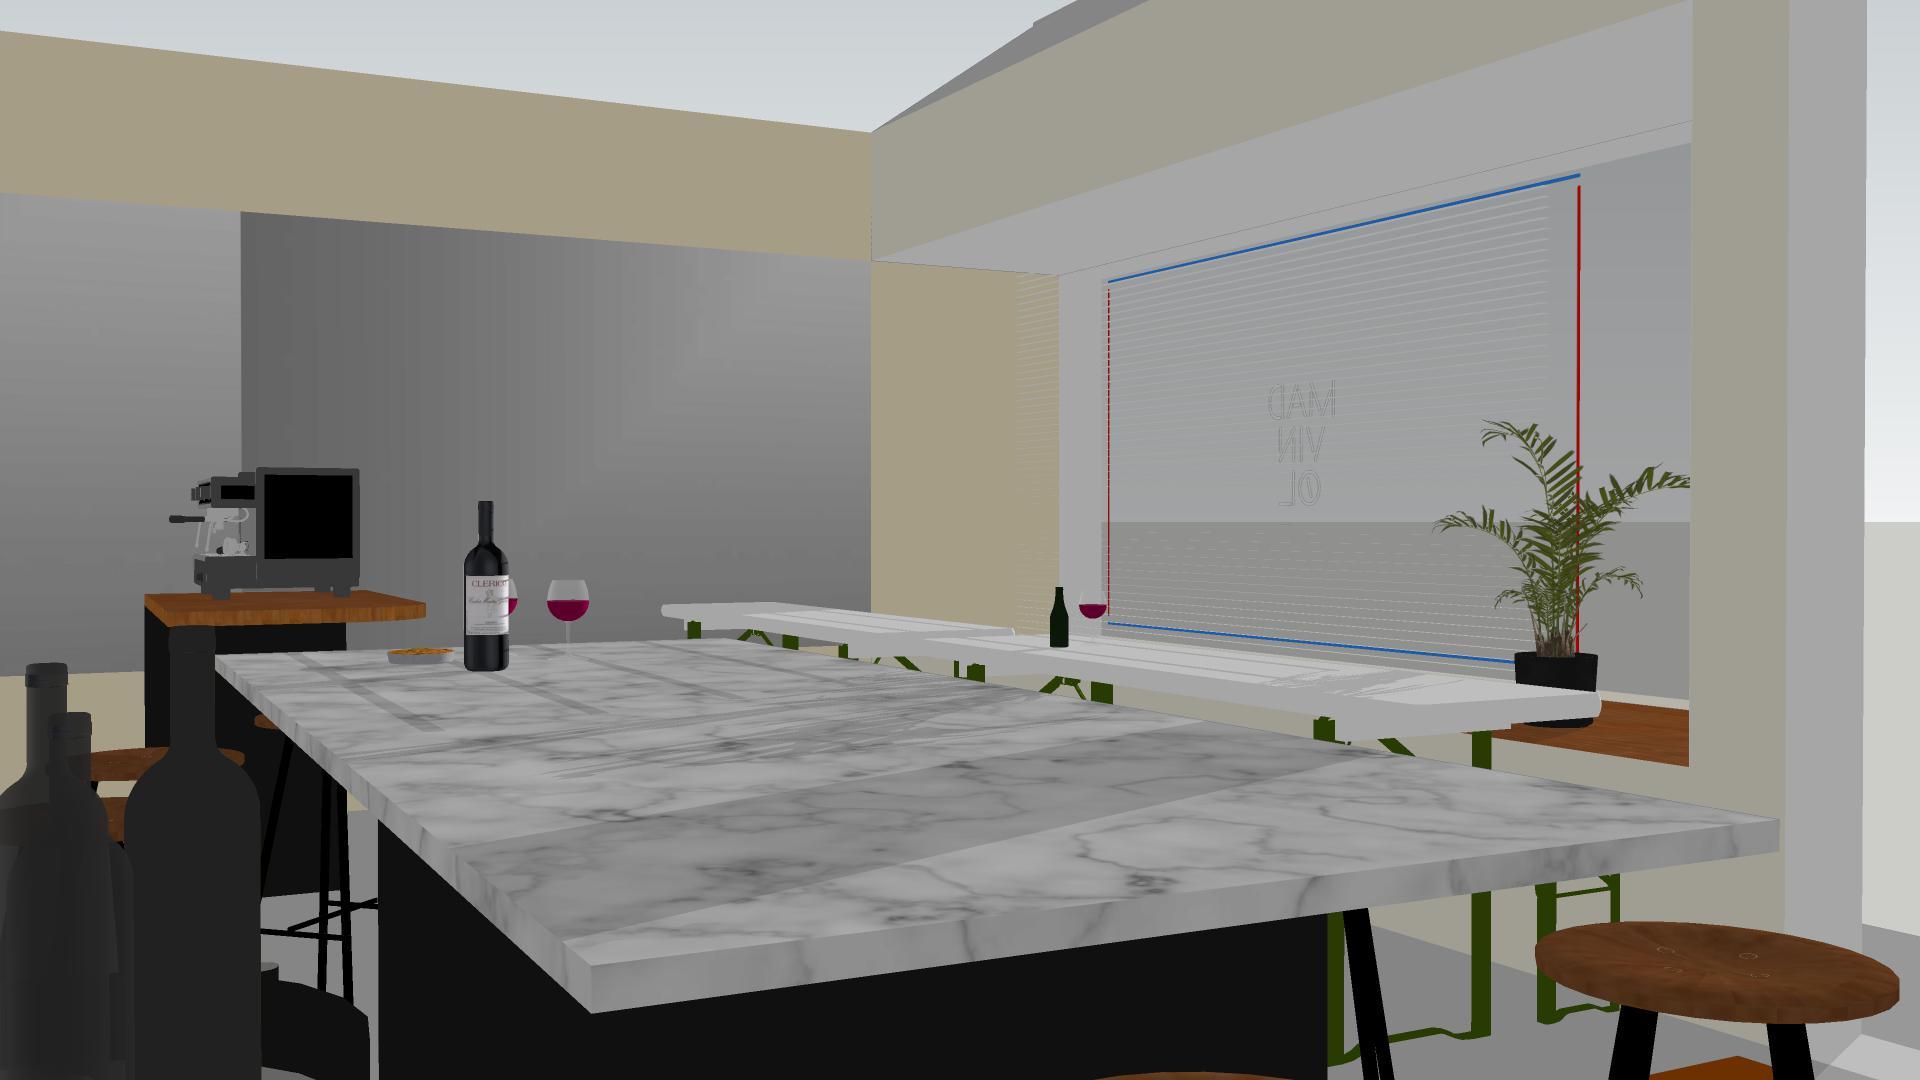 Peryton-Sketchup 6-wine bar0017.jpg